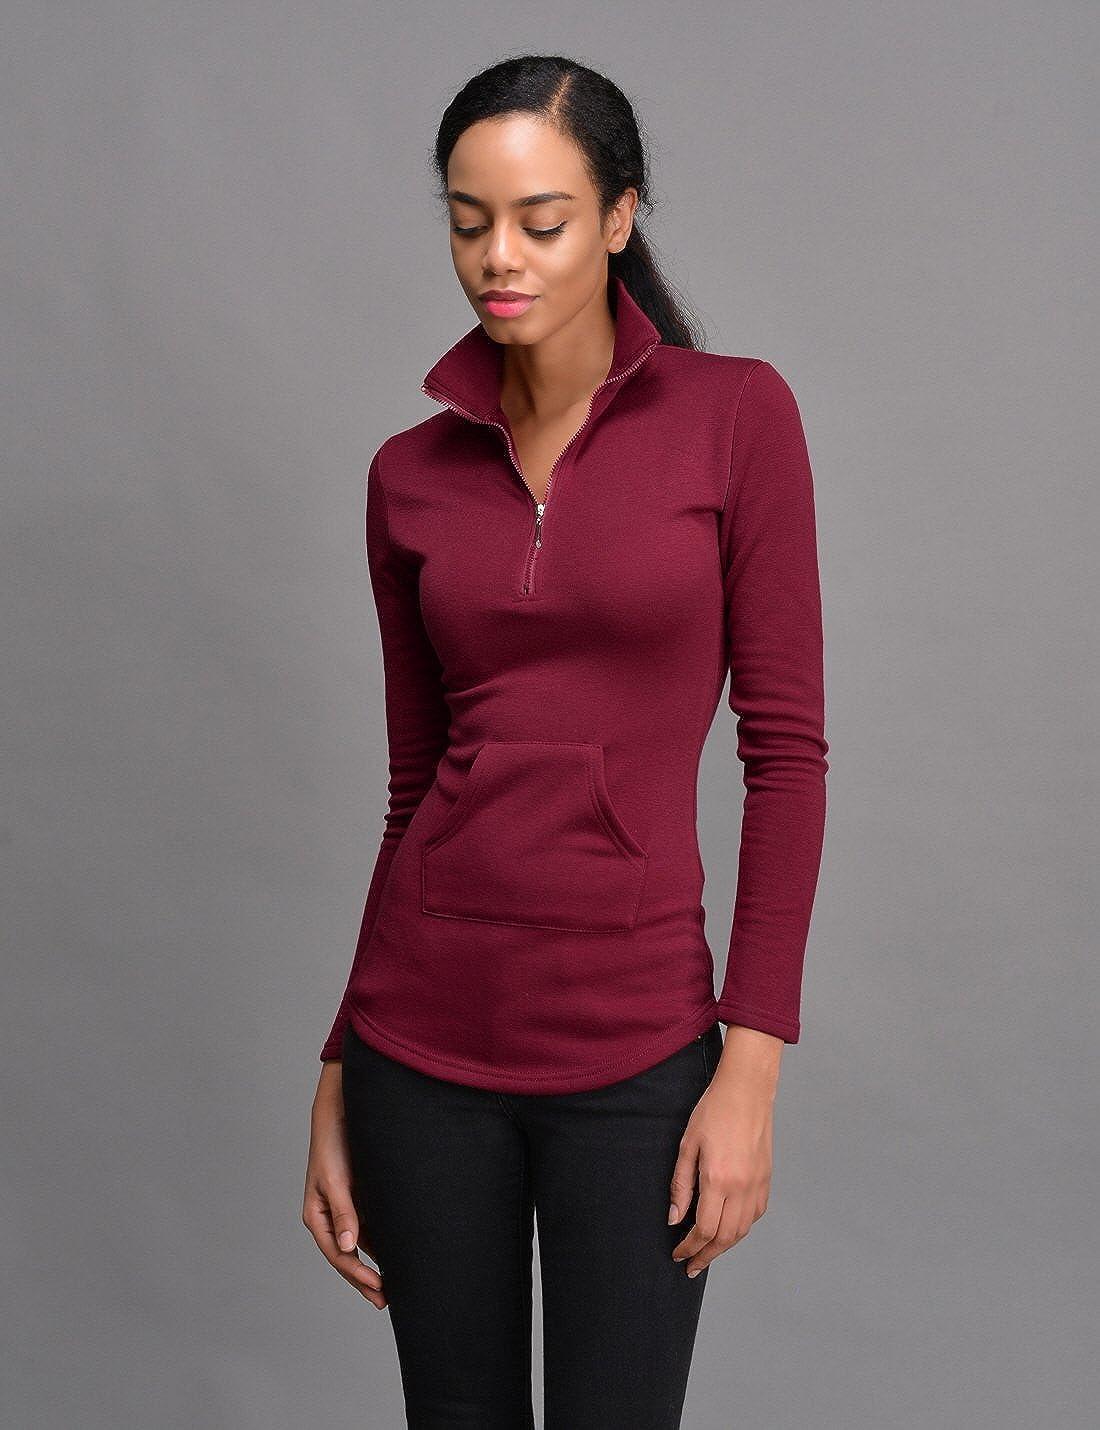 NEARKIN Women Long Sleeve Turtleneck Pullover Zip Active T Shirt Comfy Cute Tops